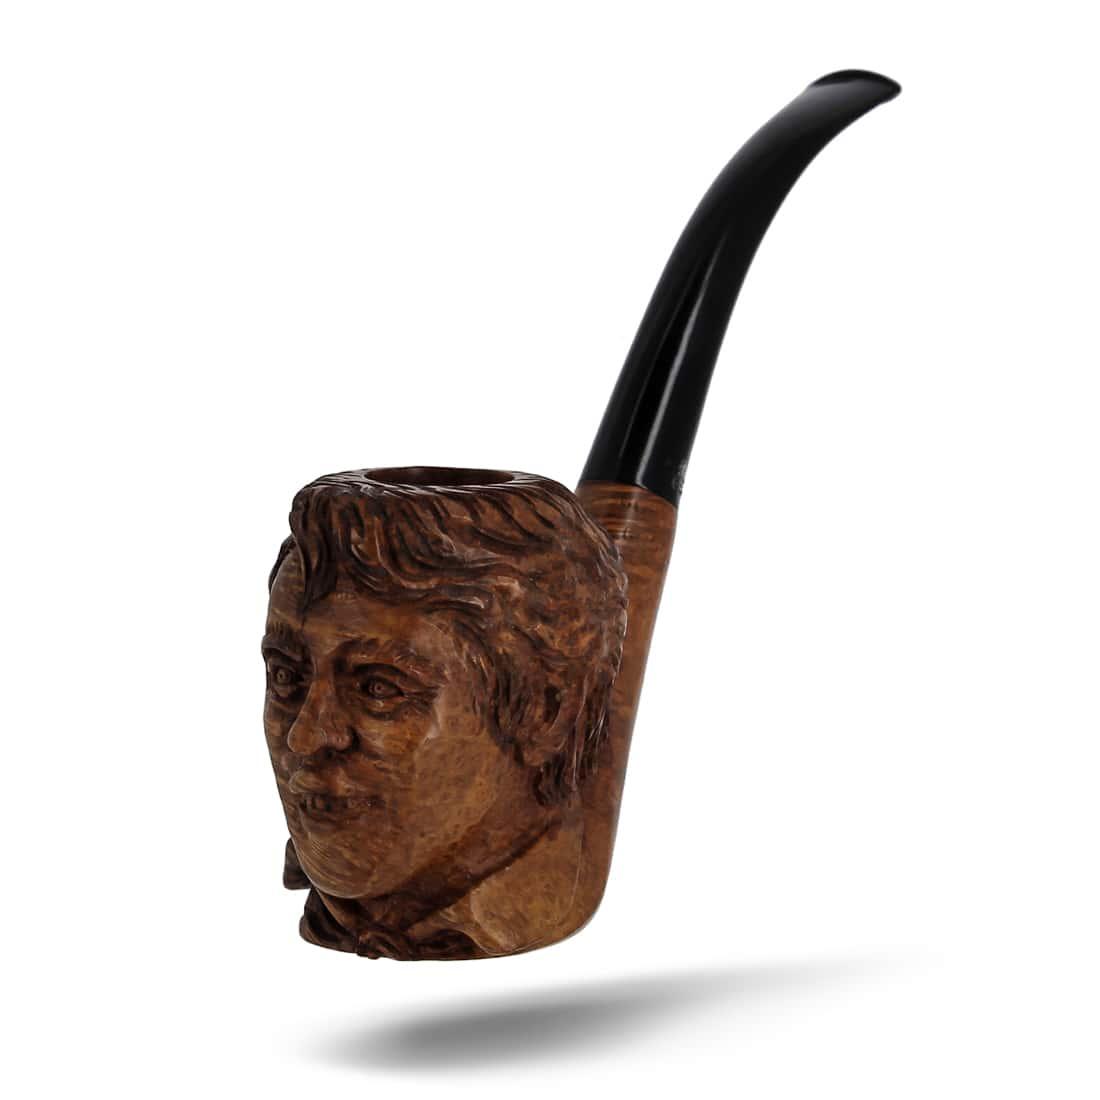 Photo #2 de Pipe de Cogolin Sculptée Brel